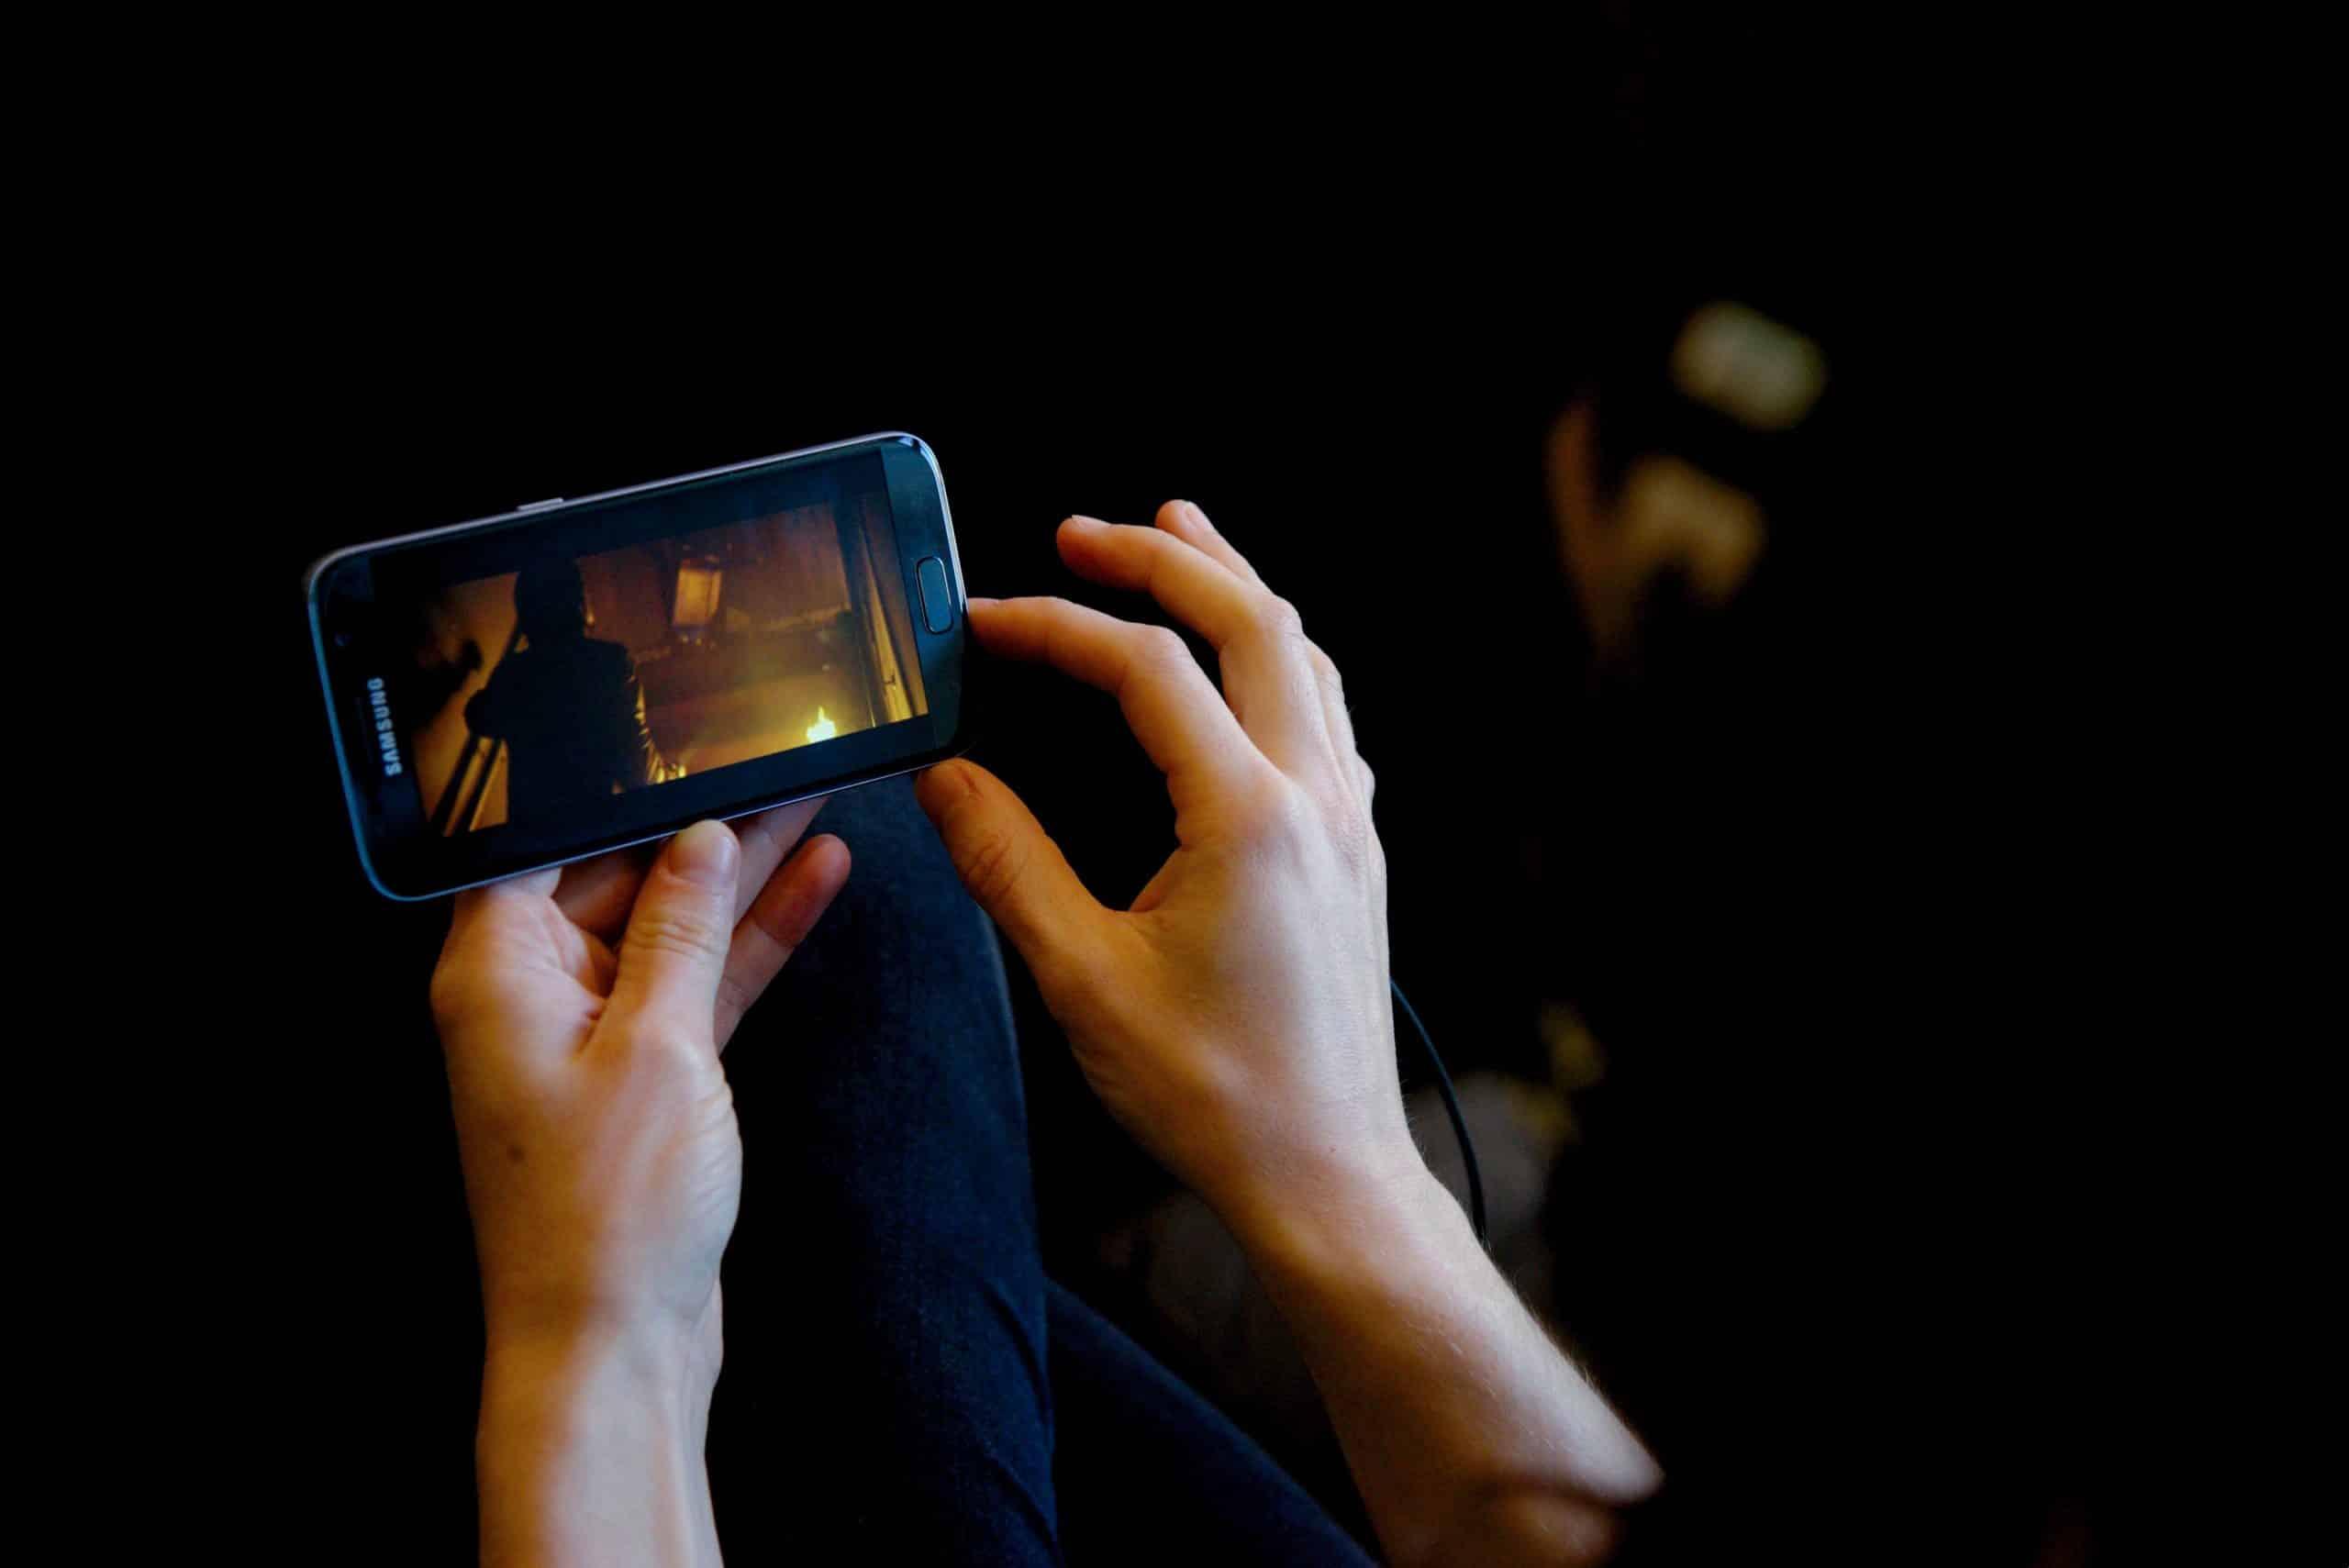 15+ Aplikasi Nonton Drama Korea di Android secara Gratis Wajib Kamu Coba